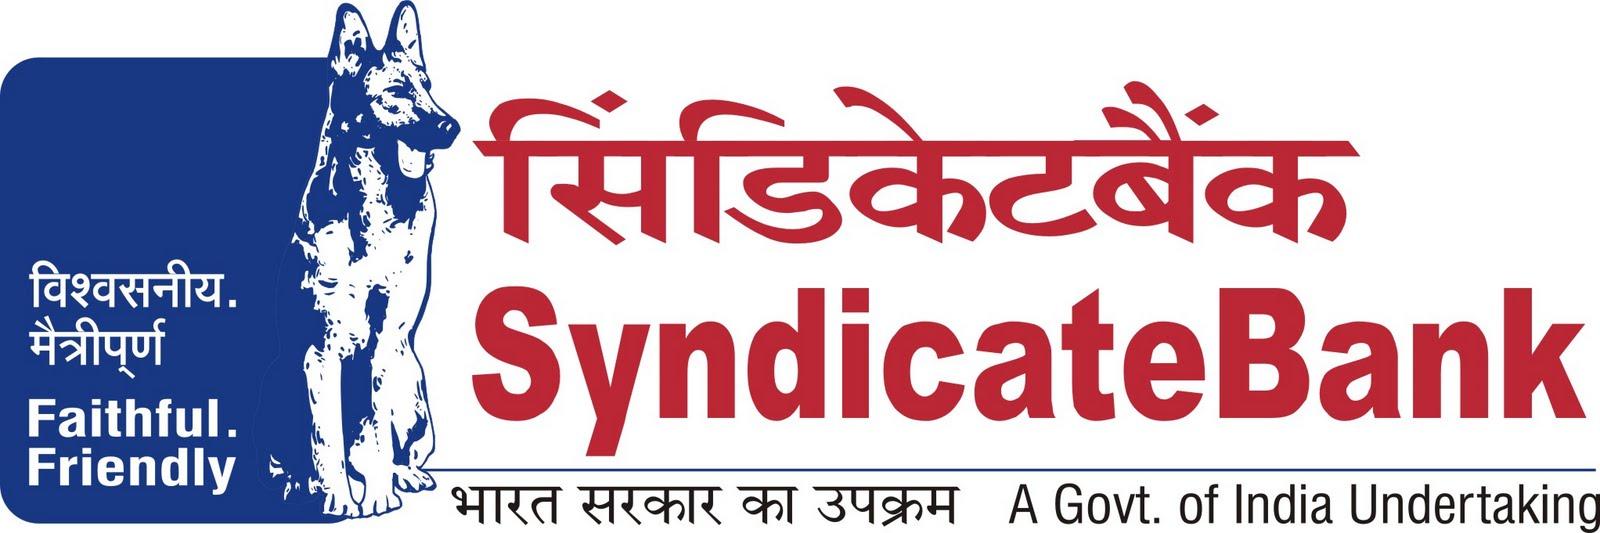 Syndicate Bank080 22267545 Syndicate Bank Syndicate Bank